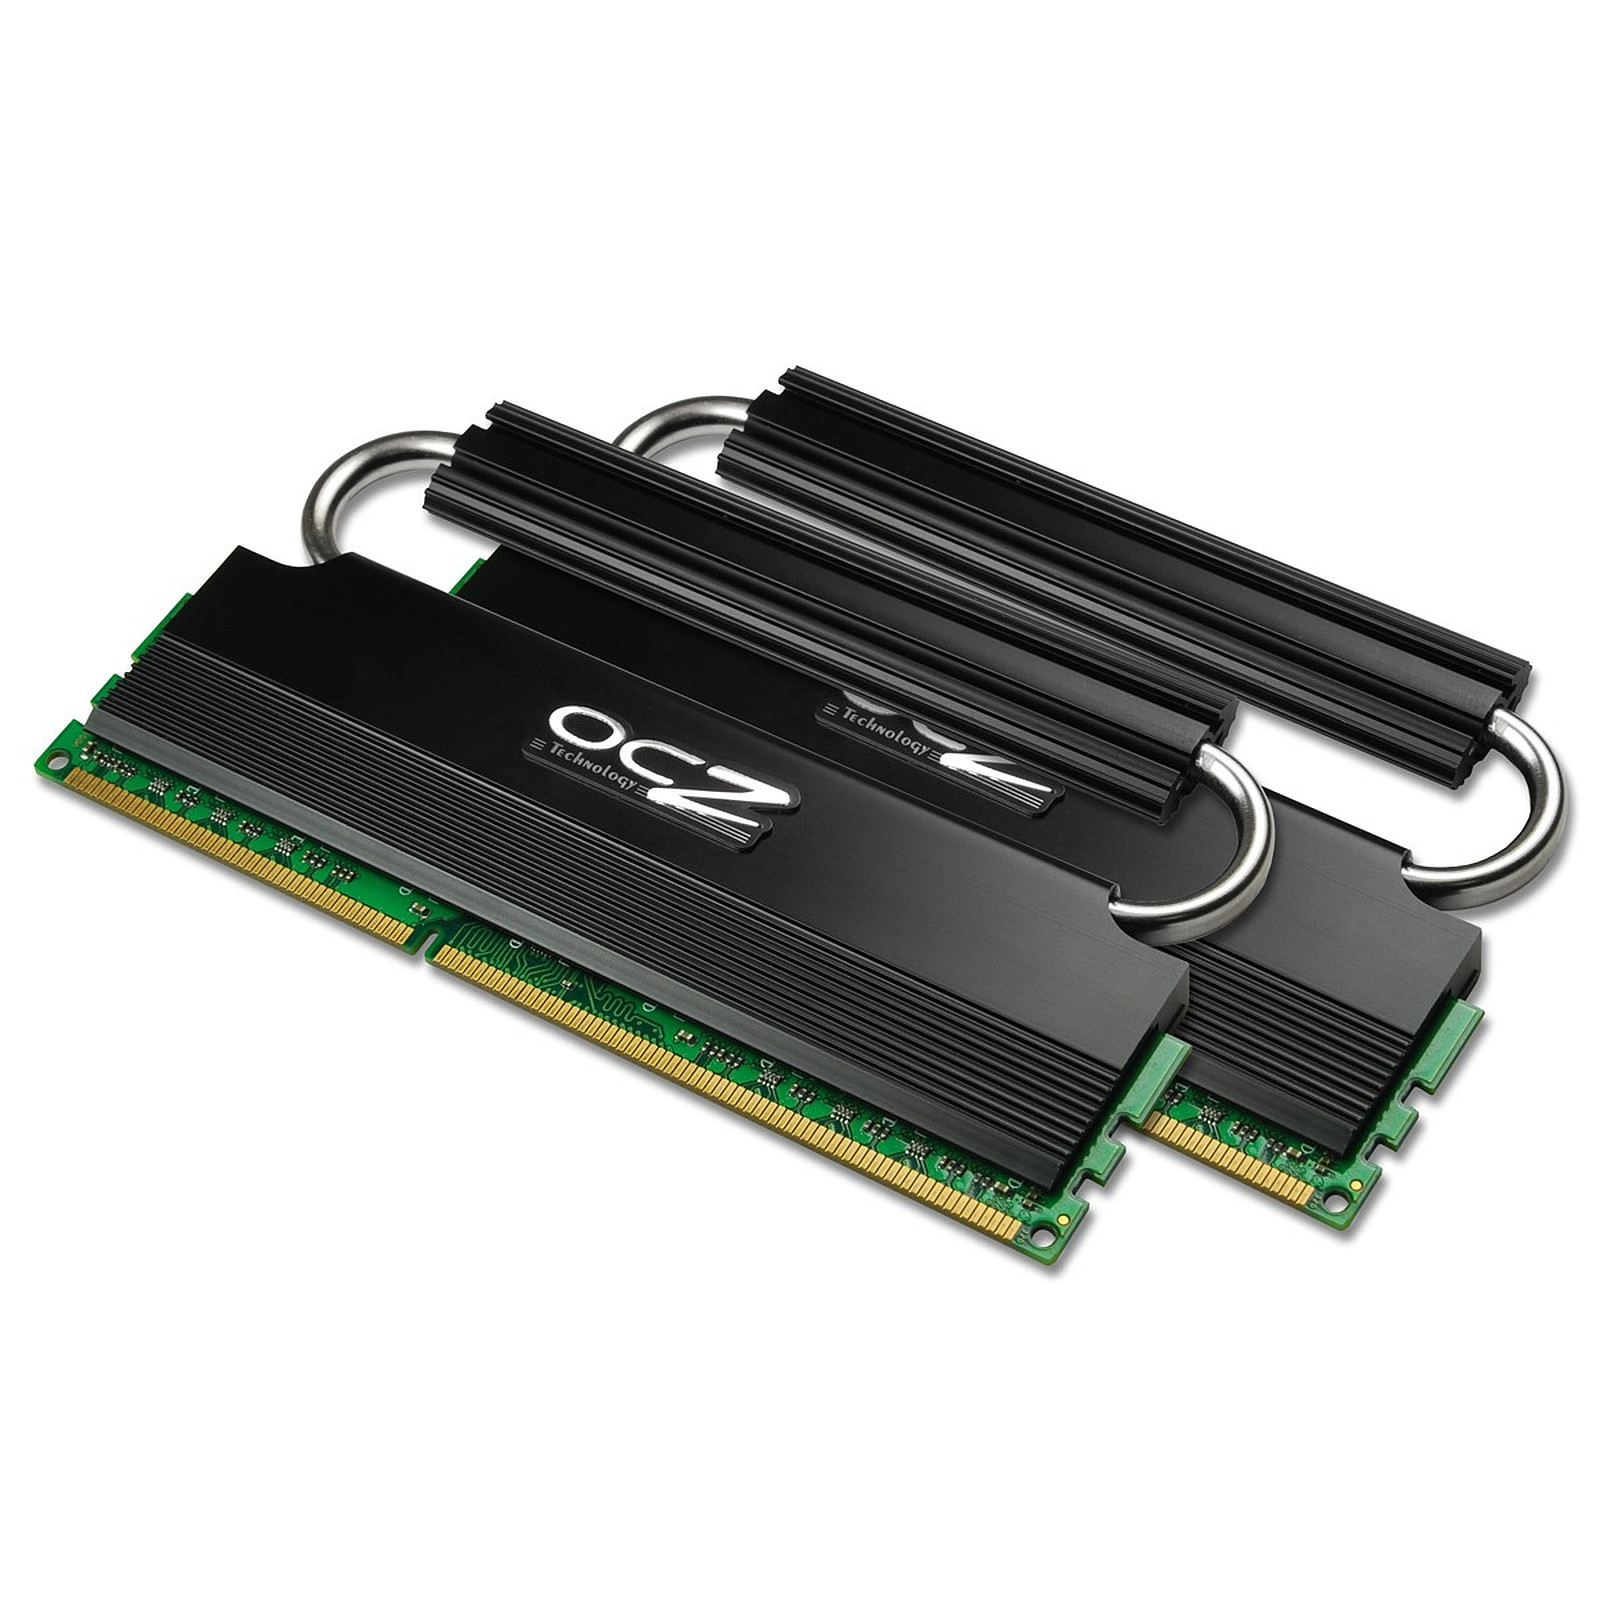 OCZ Reaper HPC 8 Go (2x 4Go) DDR3 2133 MHz